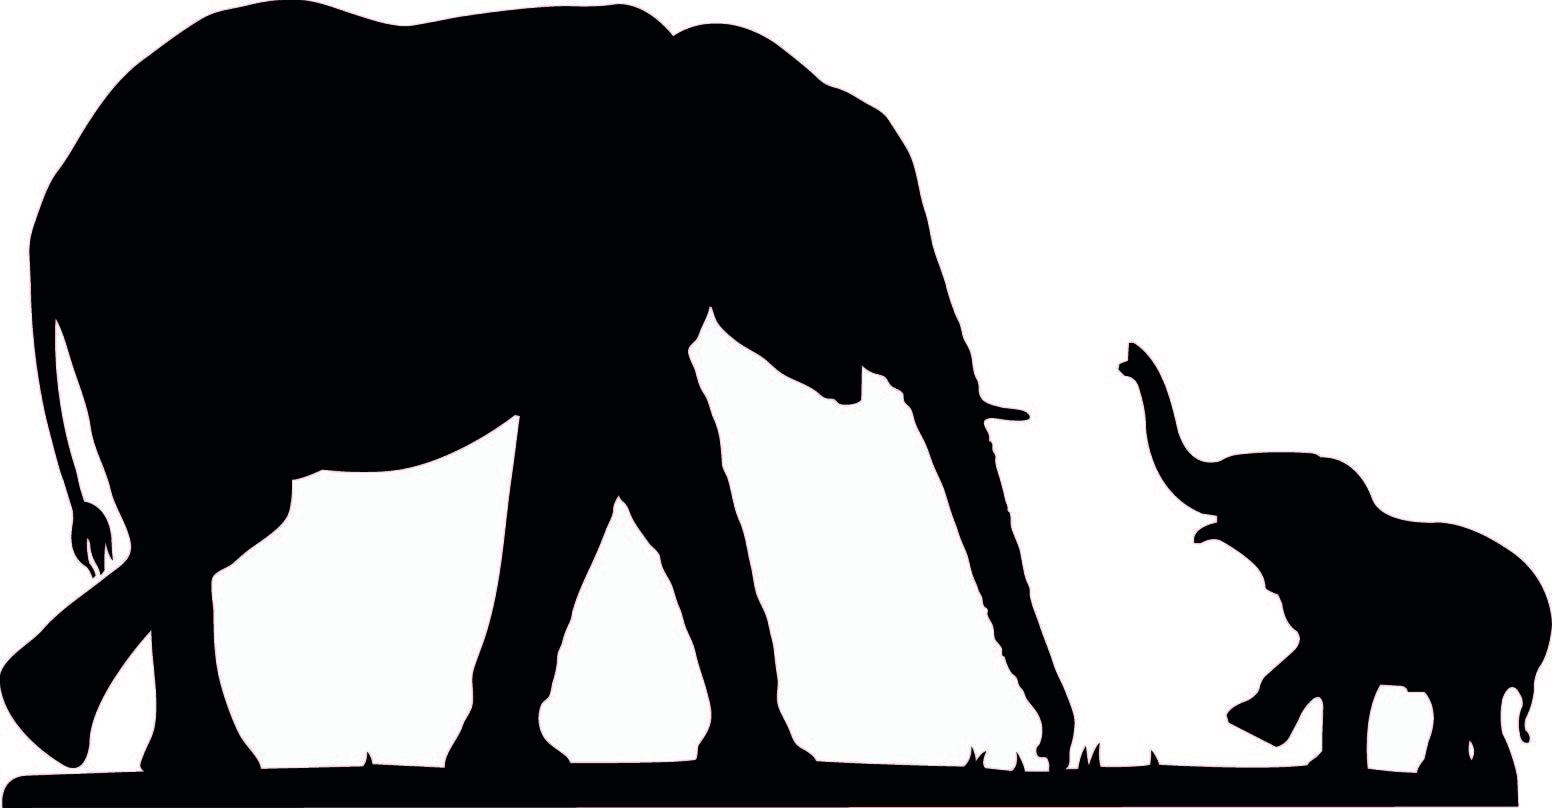 Cute Elephant Silhouet...